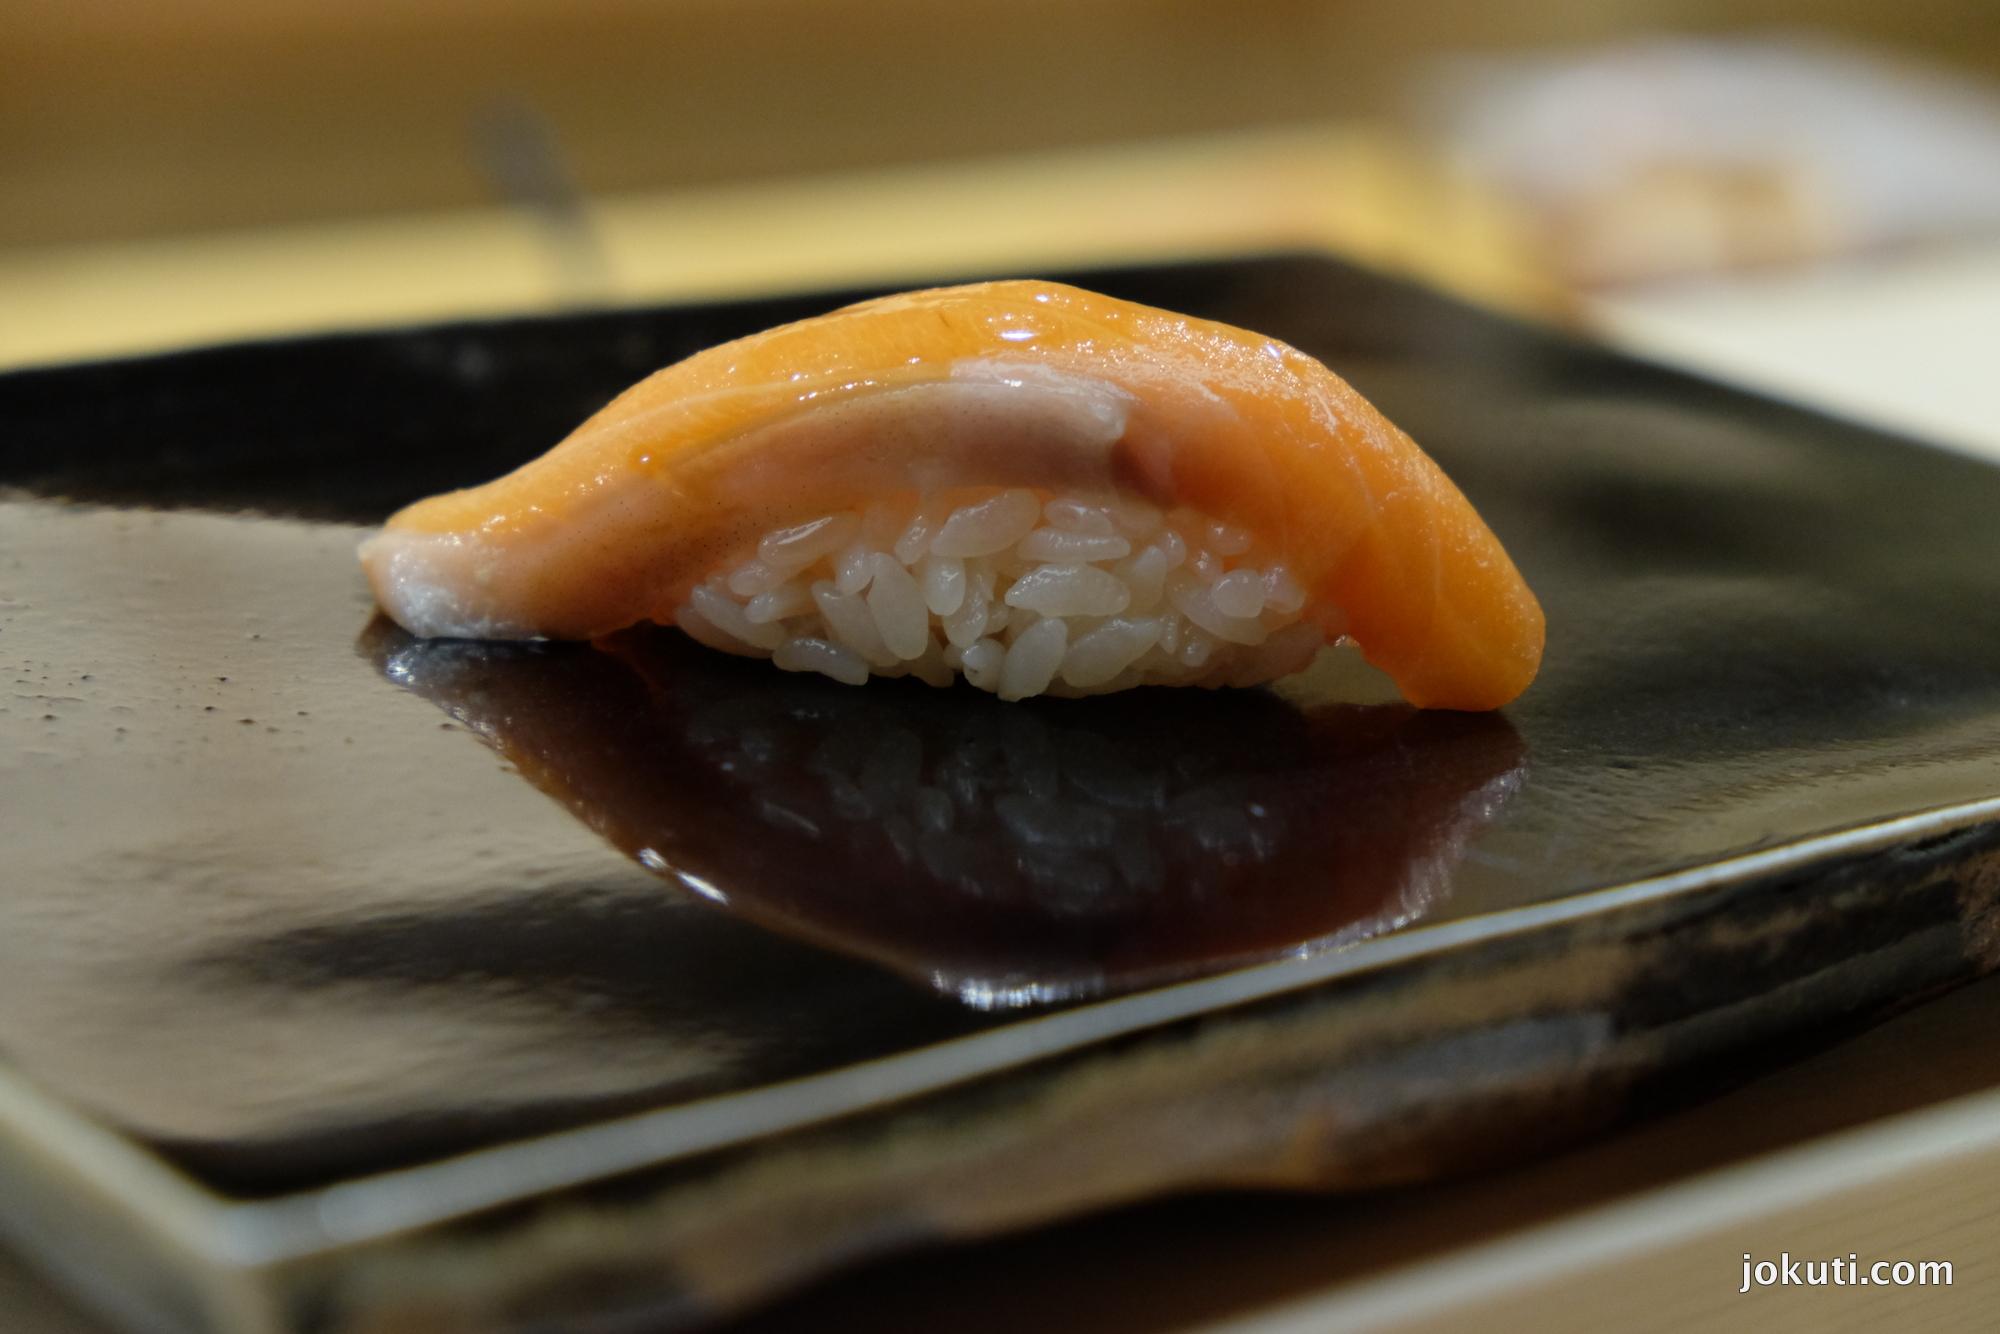 dscf5564_sugita_sushi_michelin_tokyo_japan_vilagevo_jokuti.jpg